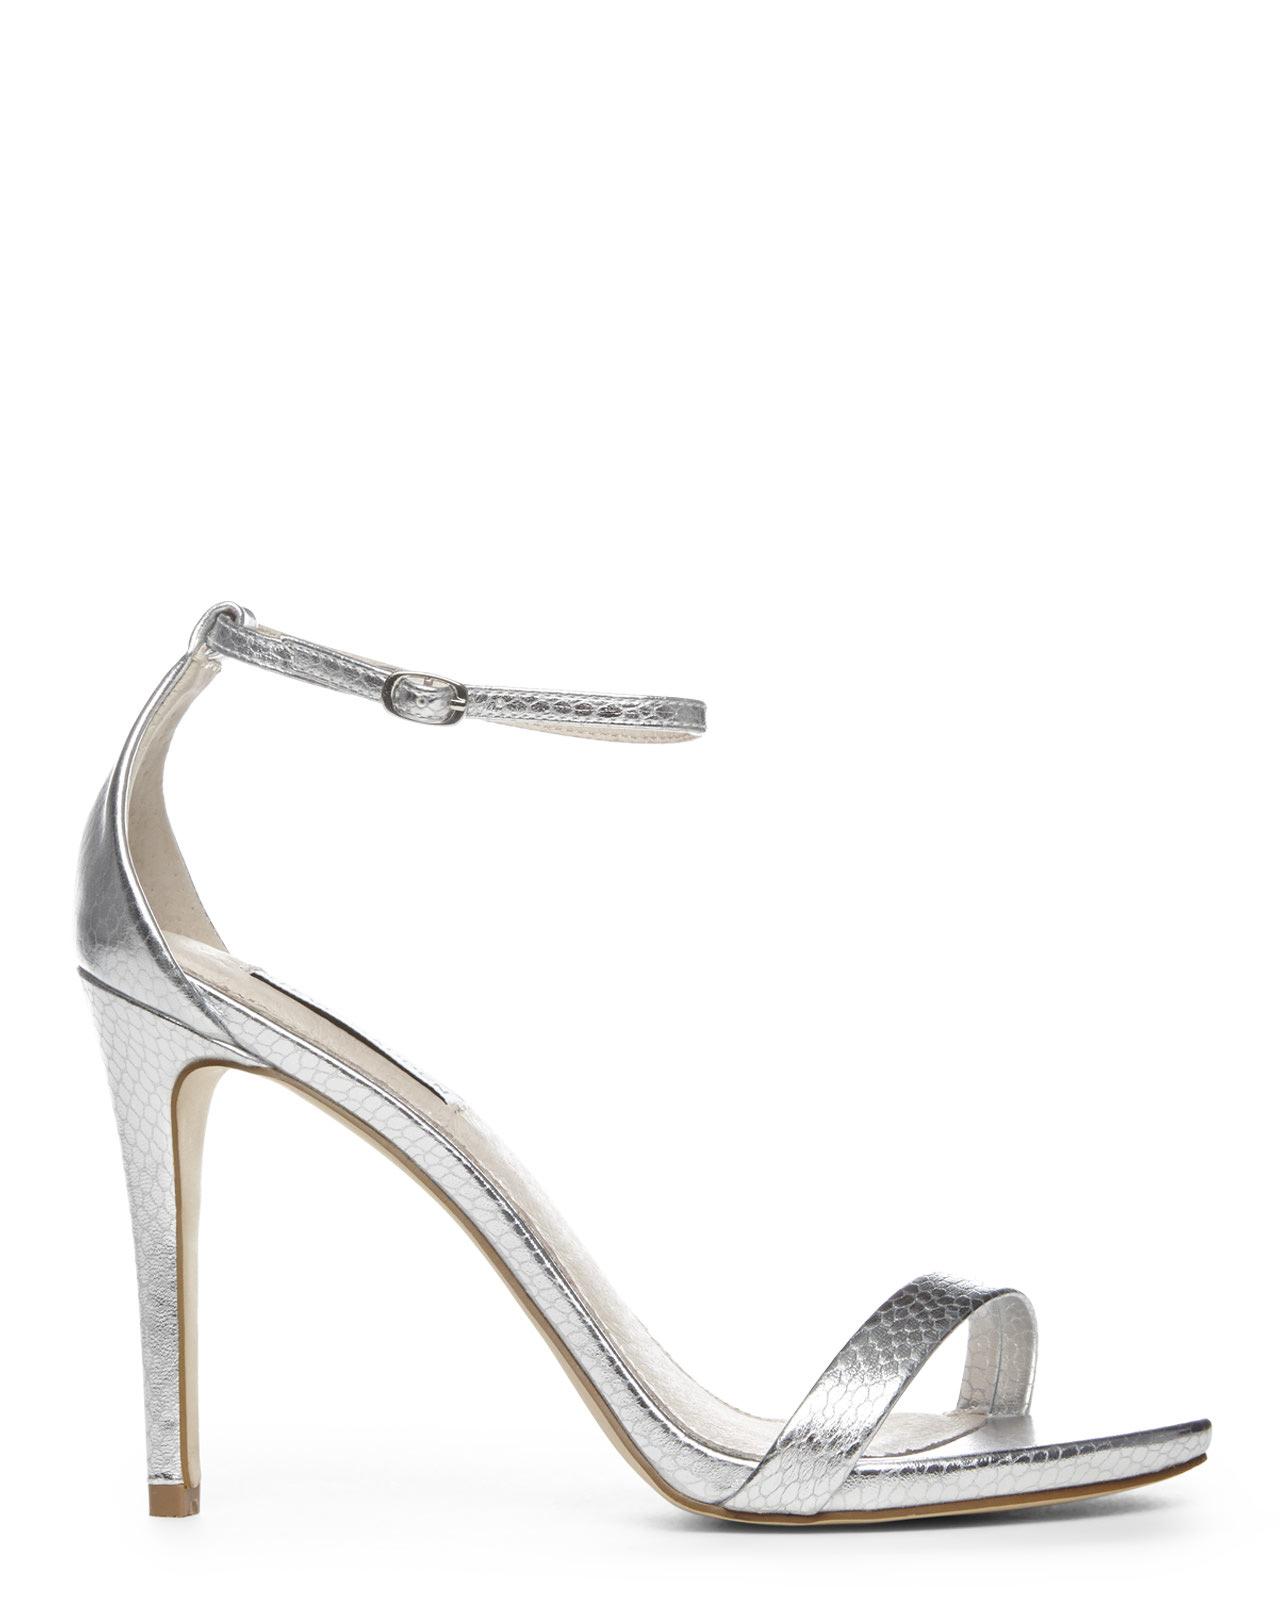 2dde821b398 Steve Madden Metallic Silver Snake Stecy Sandals